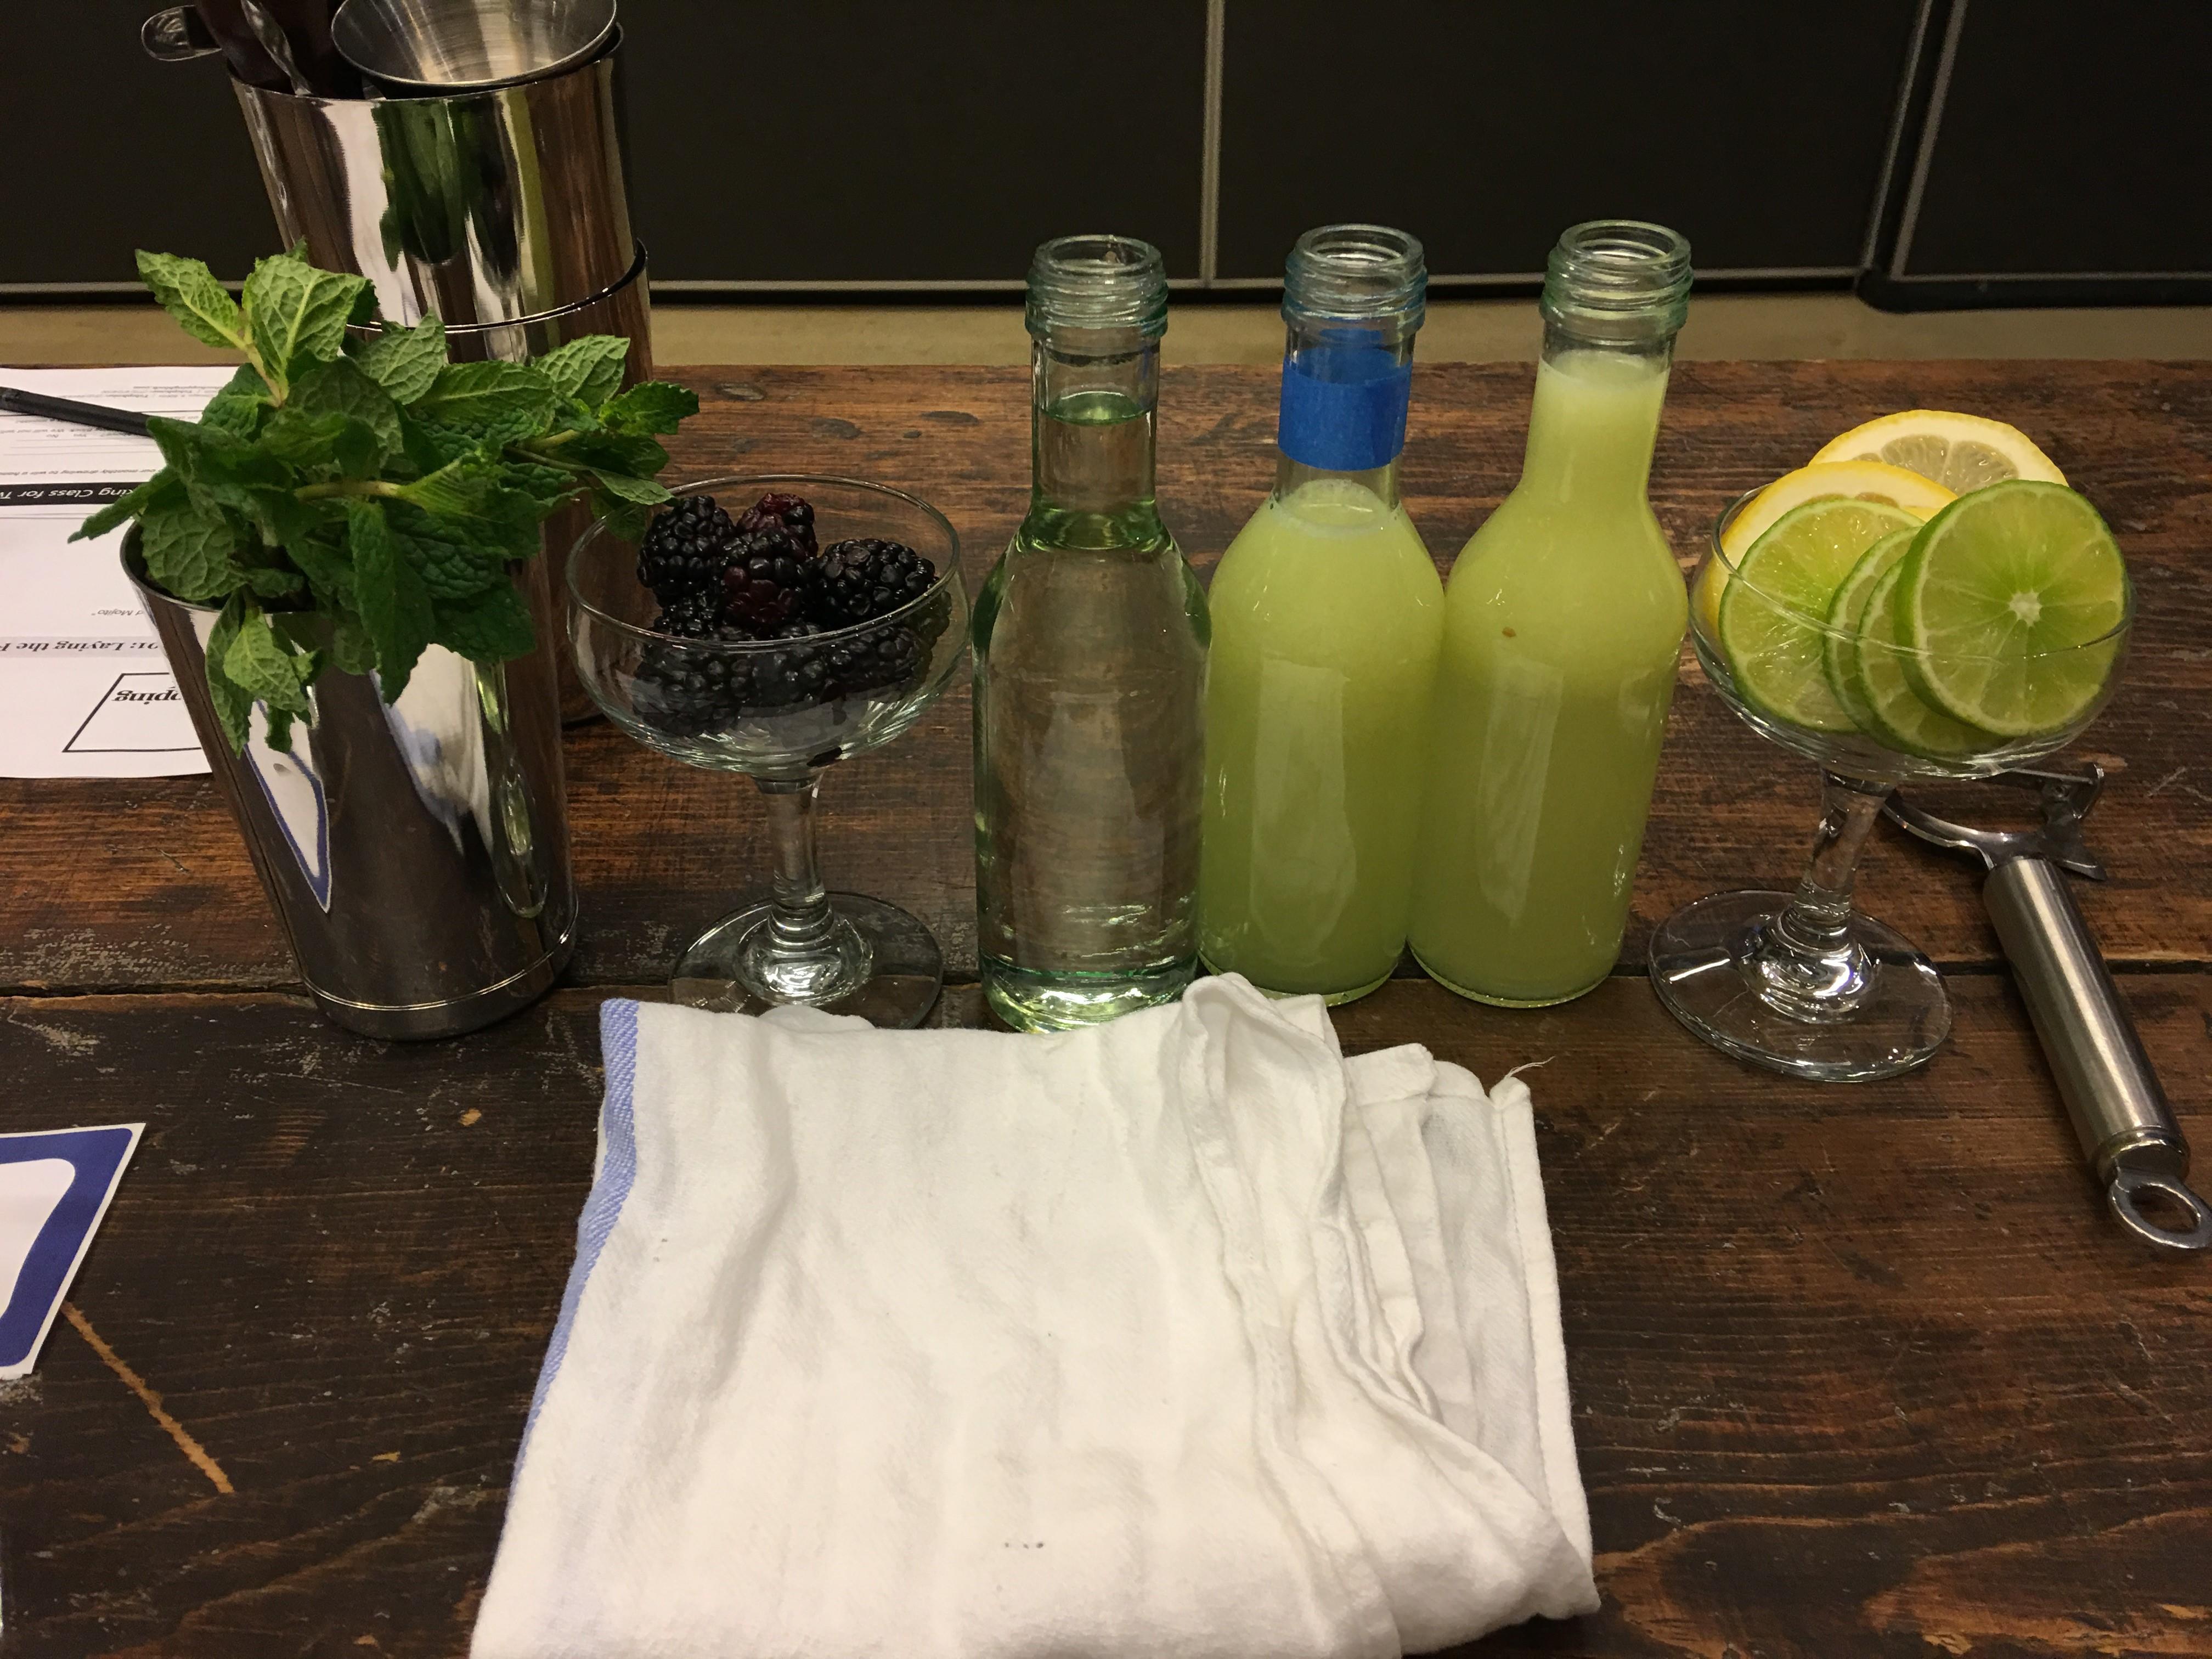 cocktail ingredients